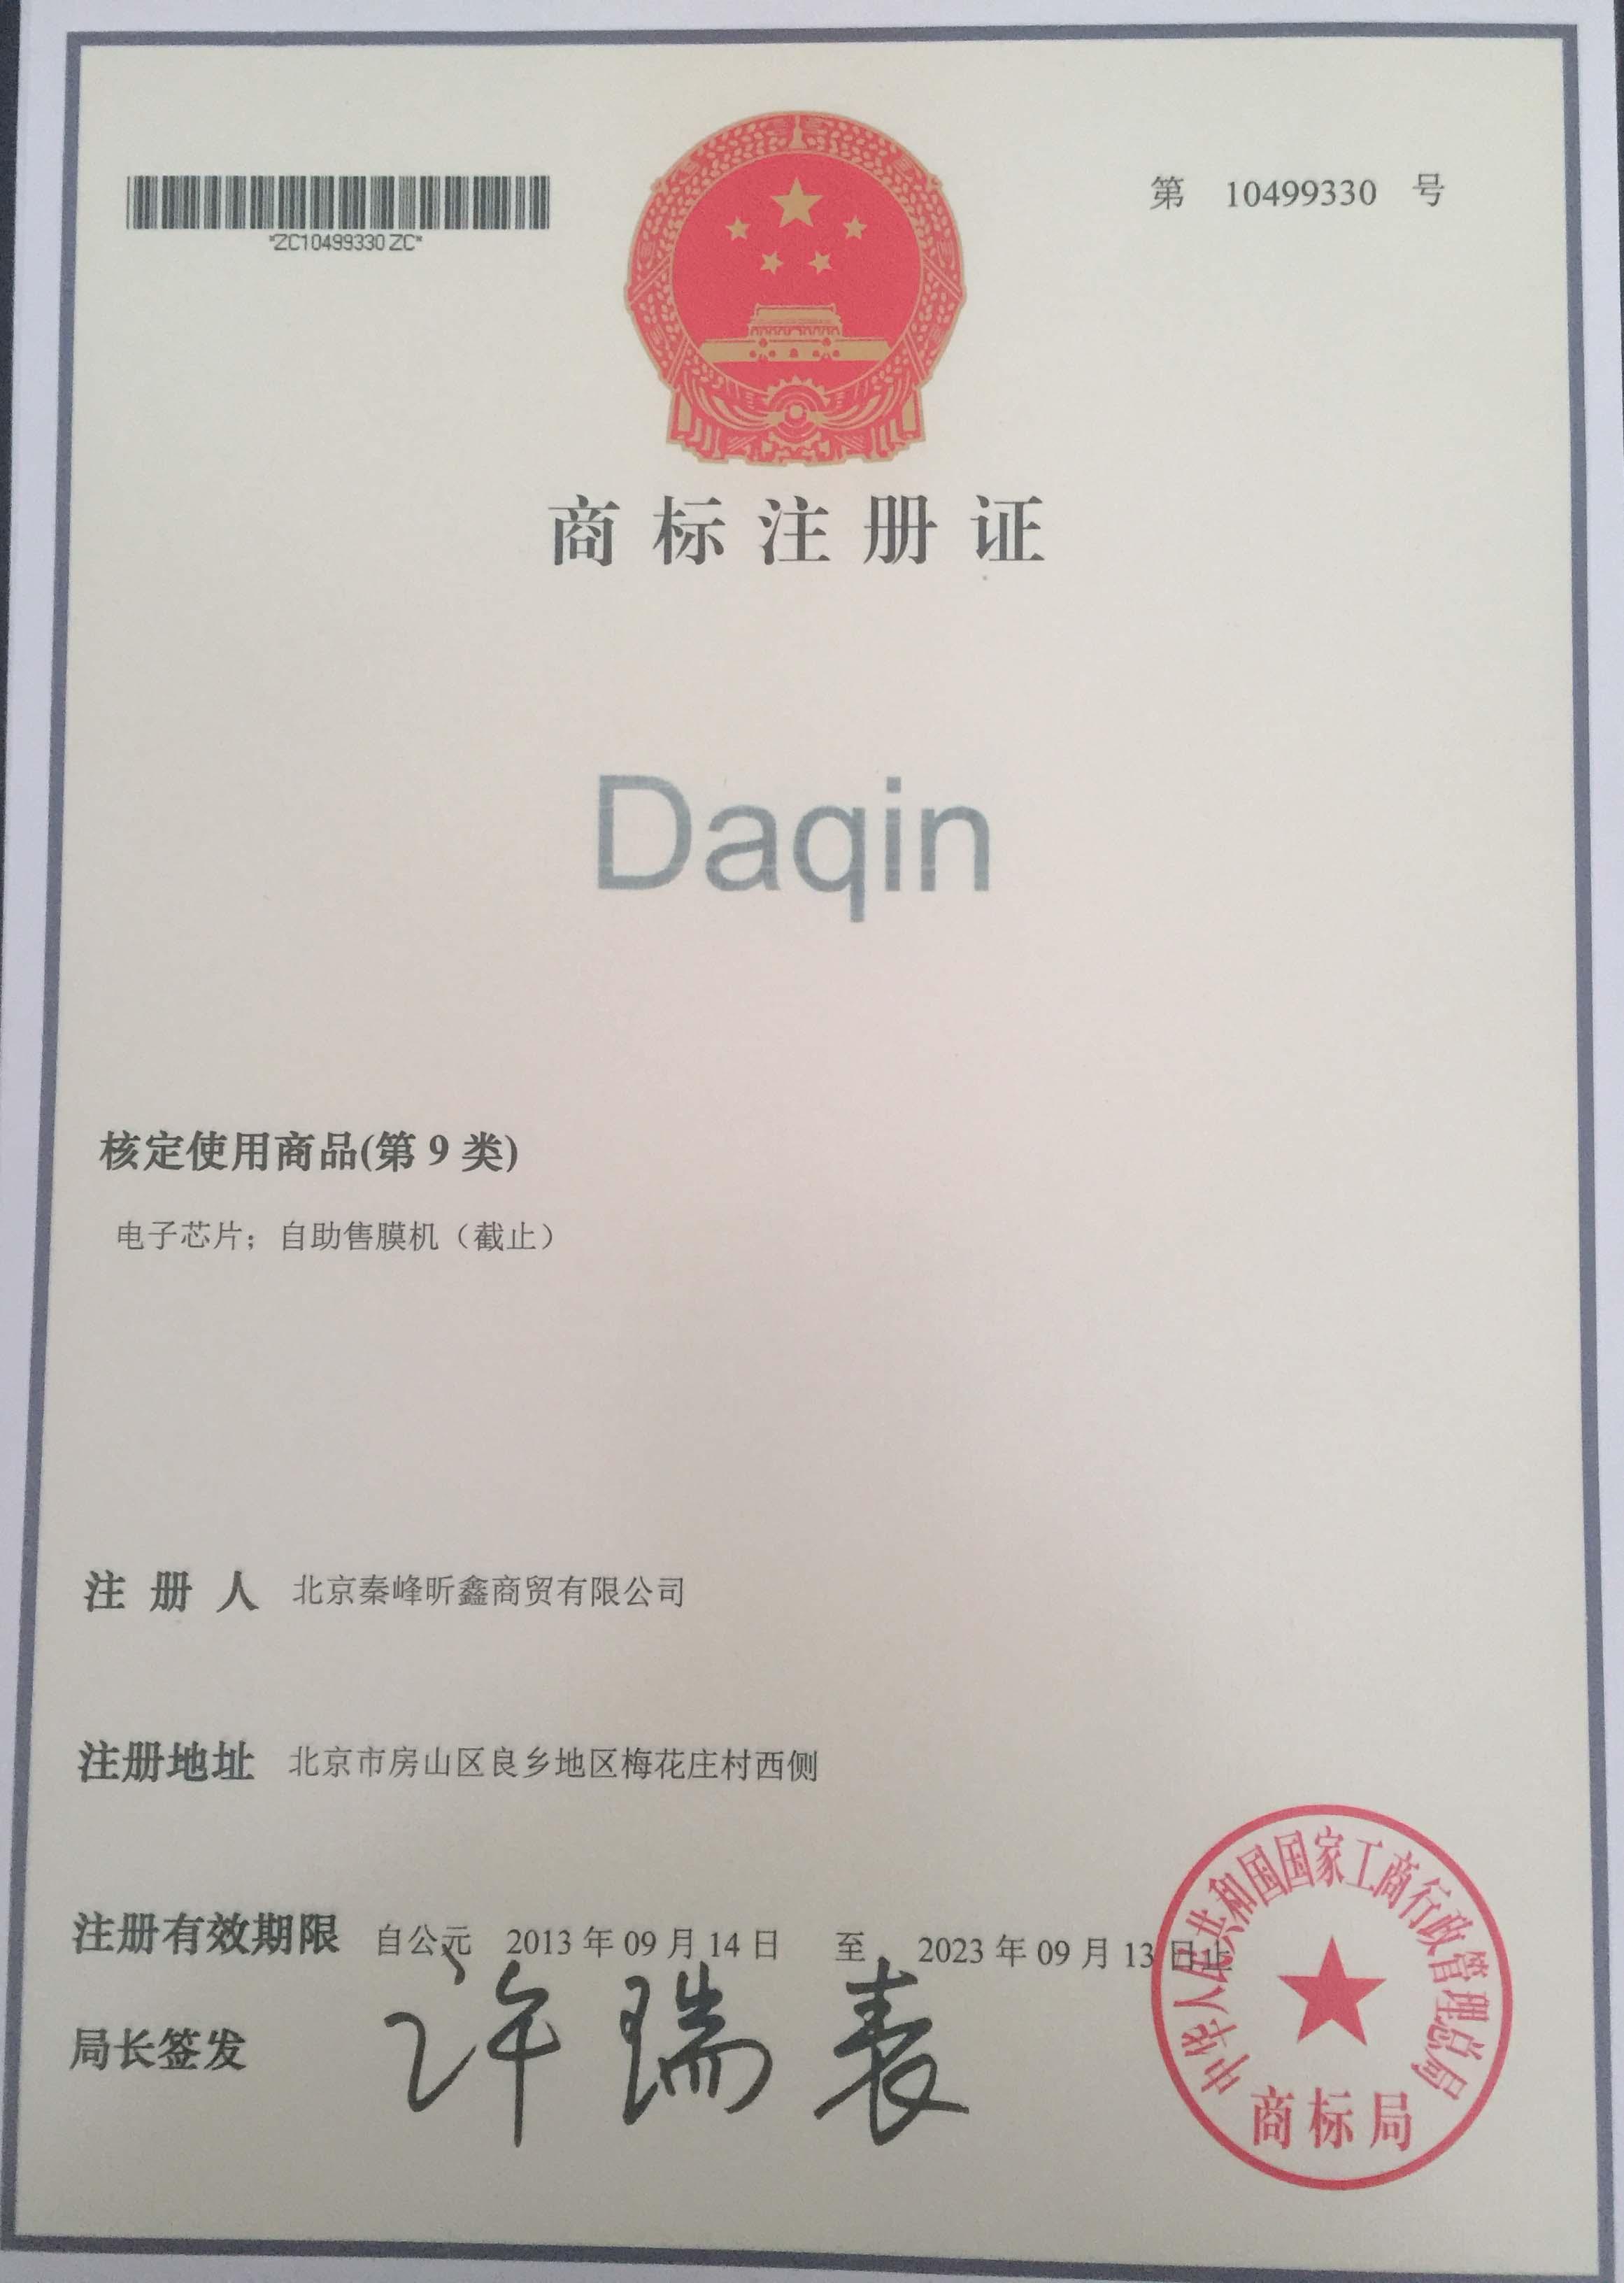 Daqin 9类商标注册证